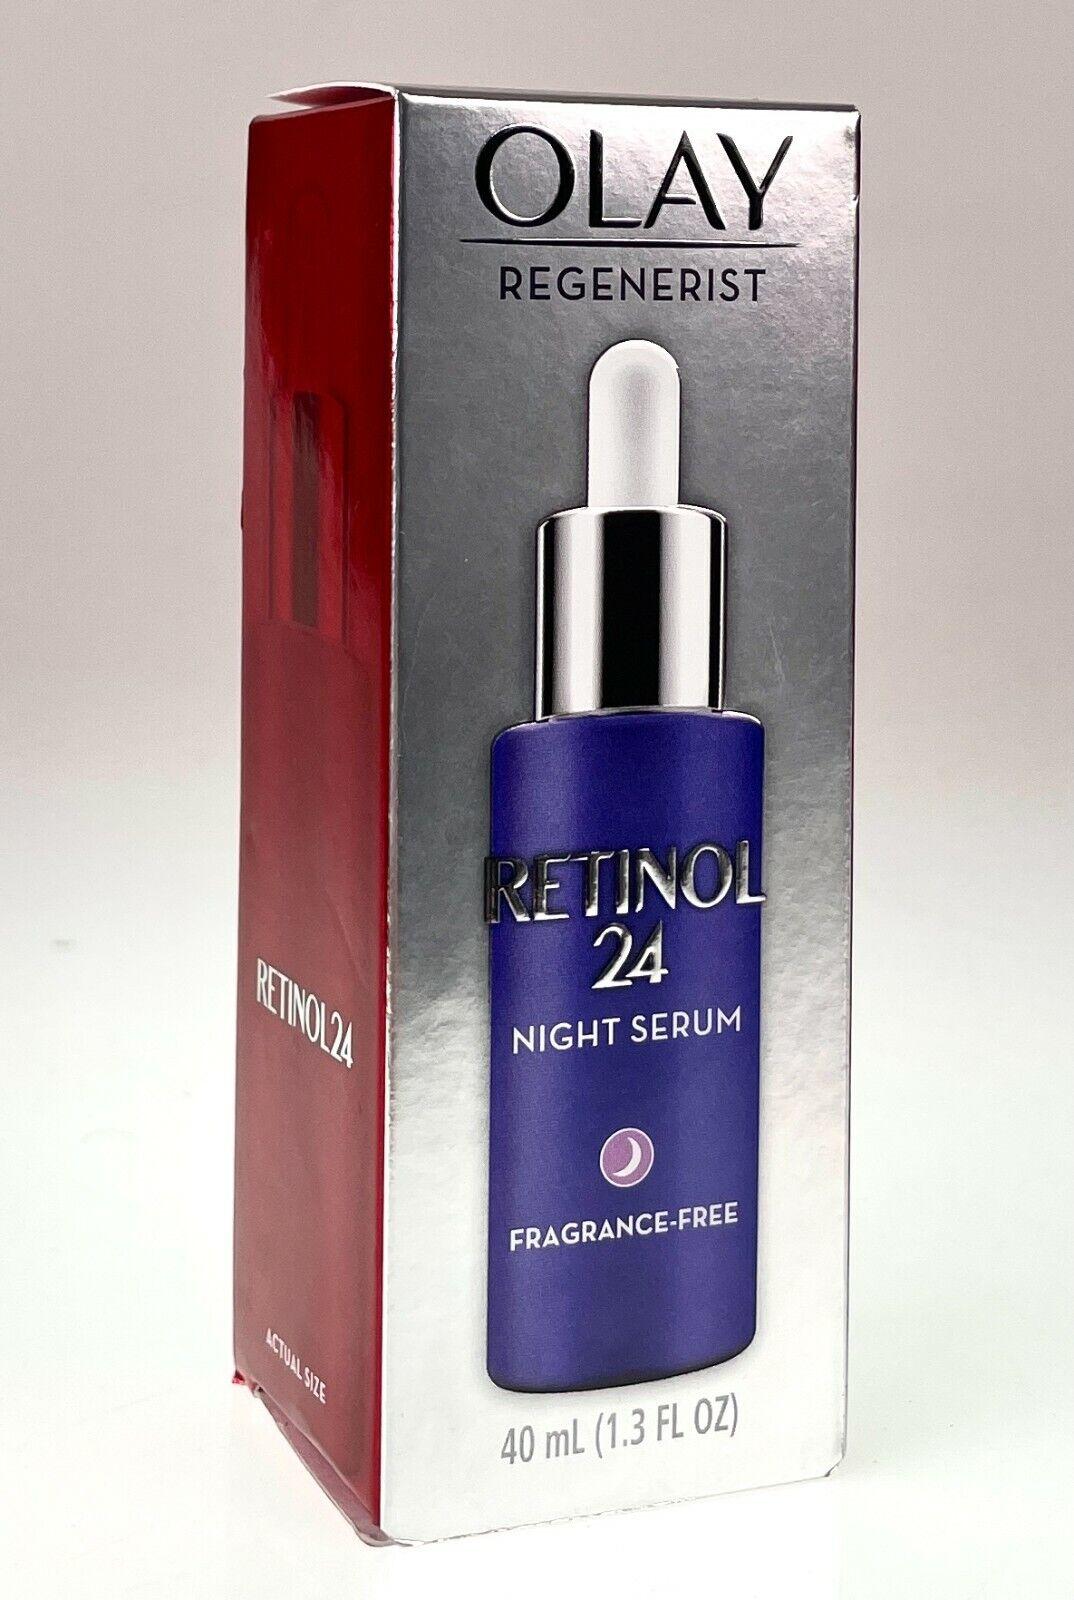 Olay Regenerist Retinol 24 Night Facial Serum Fragrance Free